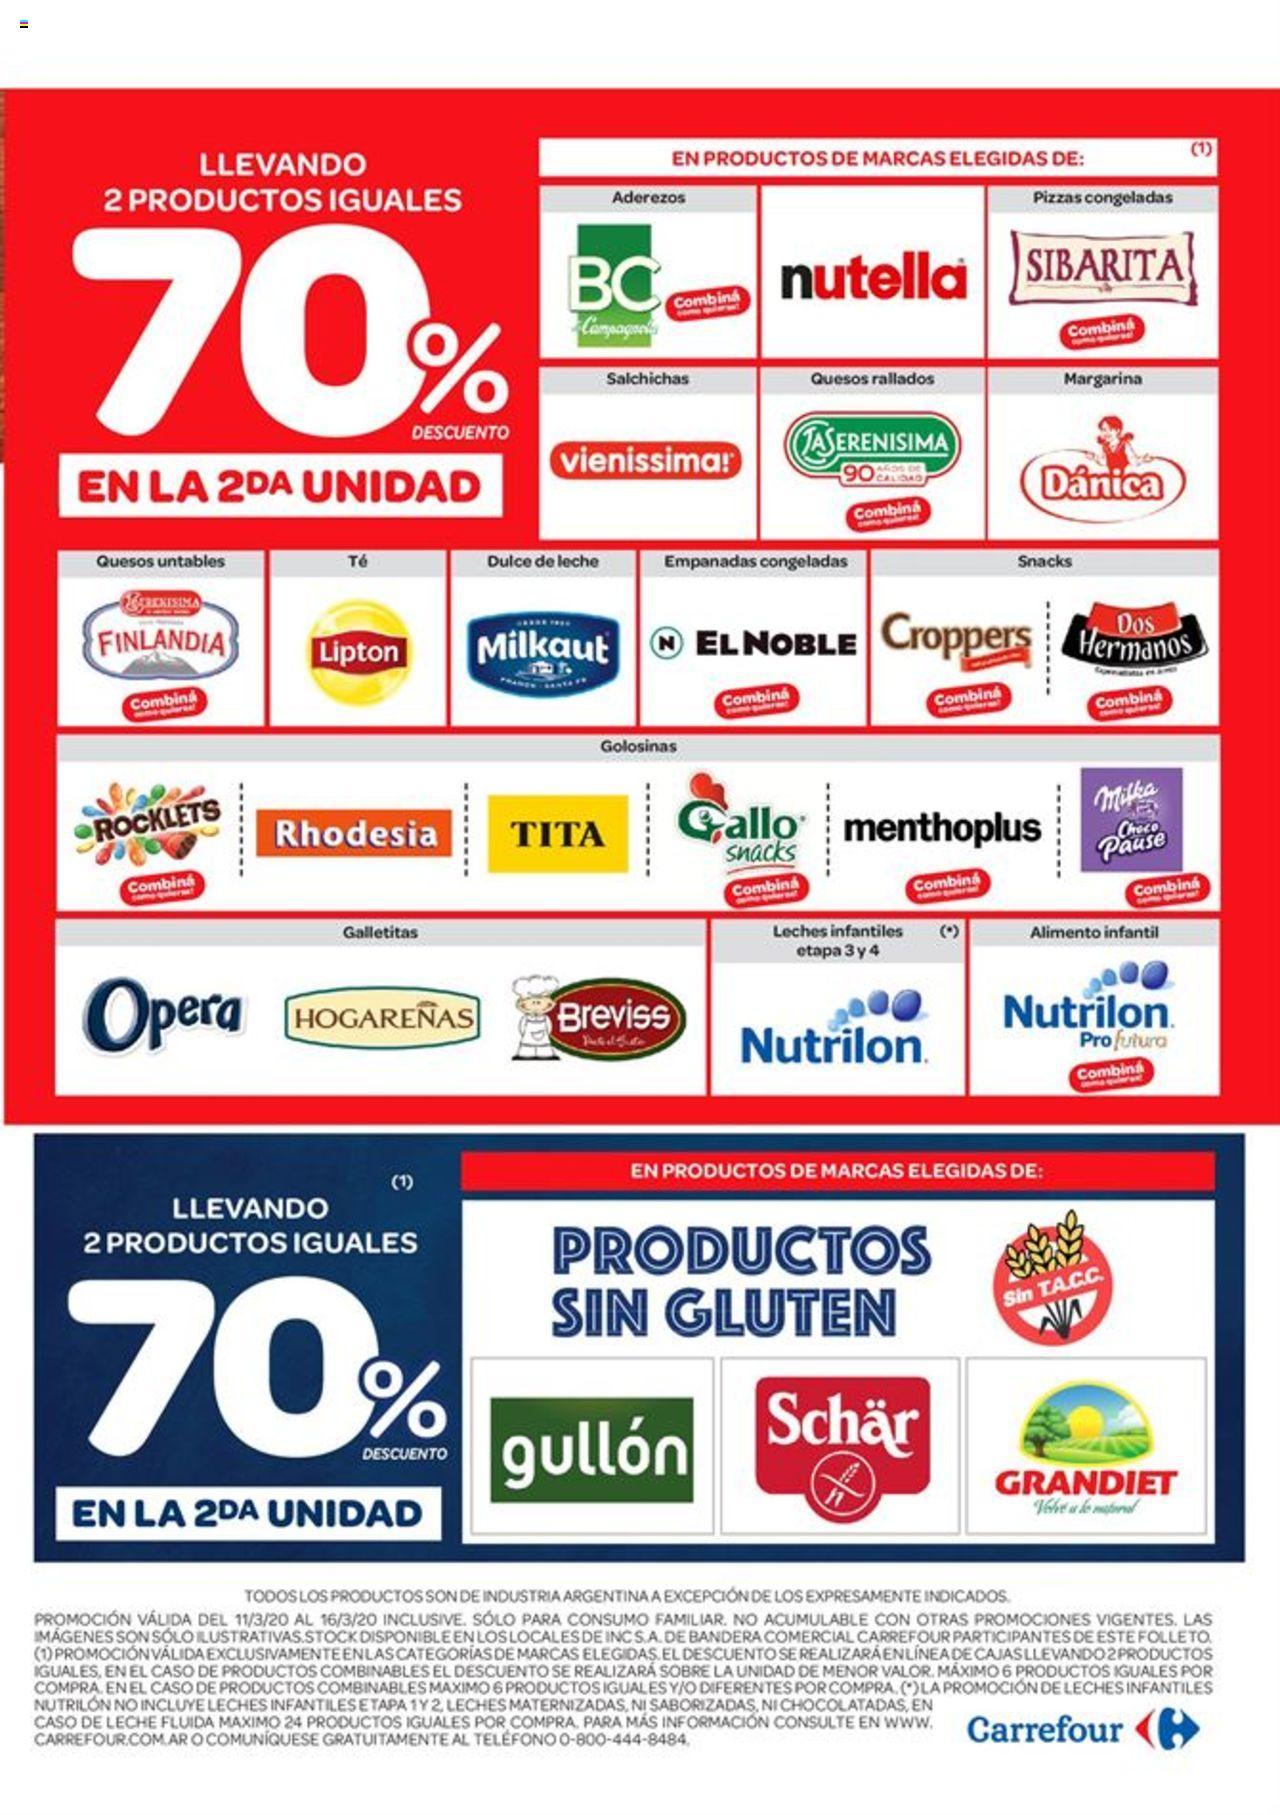 Carrefour - Catálogo válido desde el 11/03/2020 número de página 1 | Página: 3